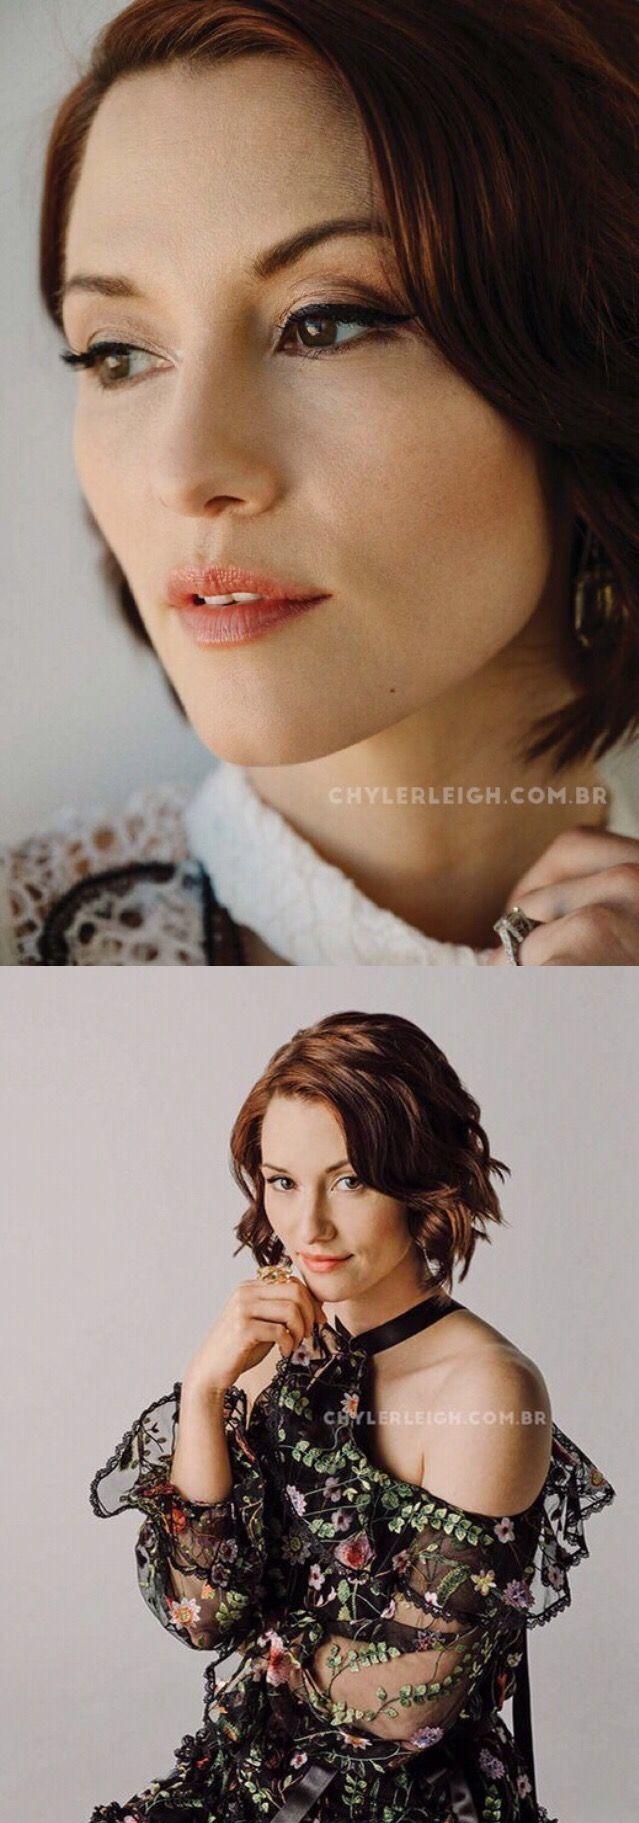 Chyler Leigh is such a beauty